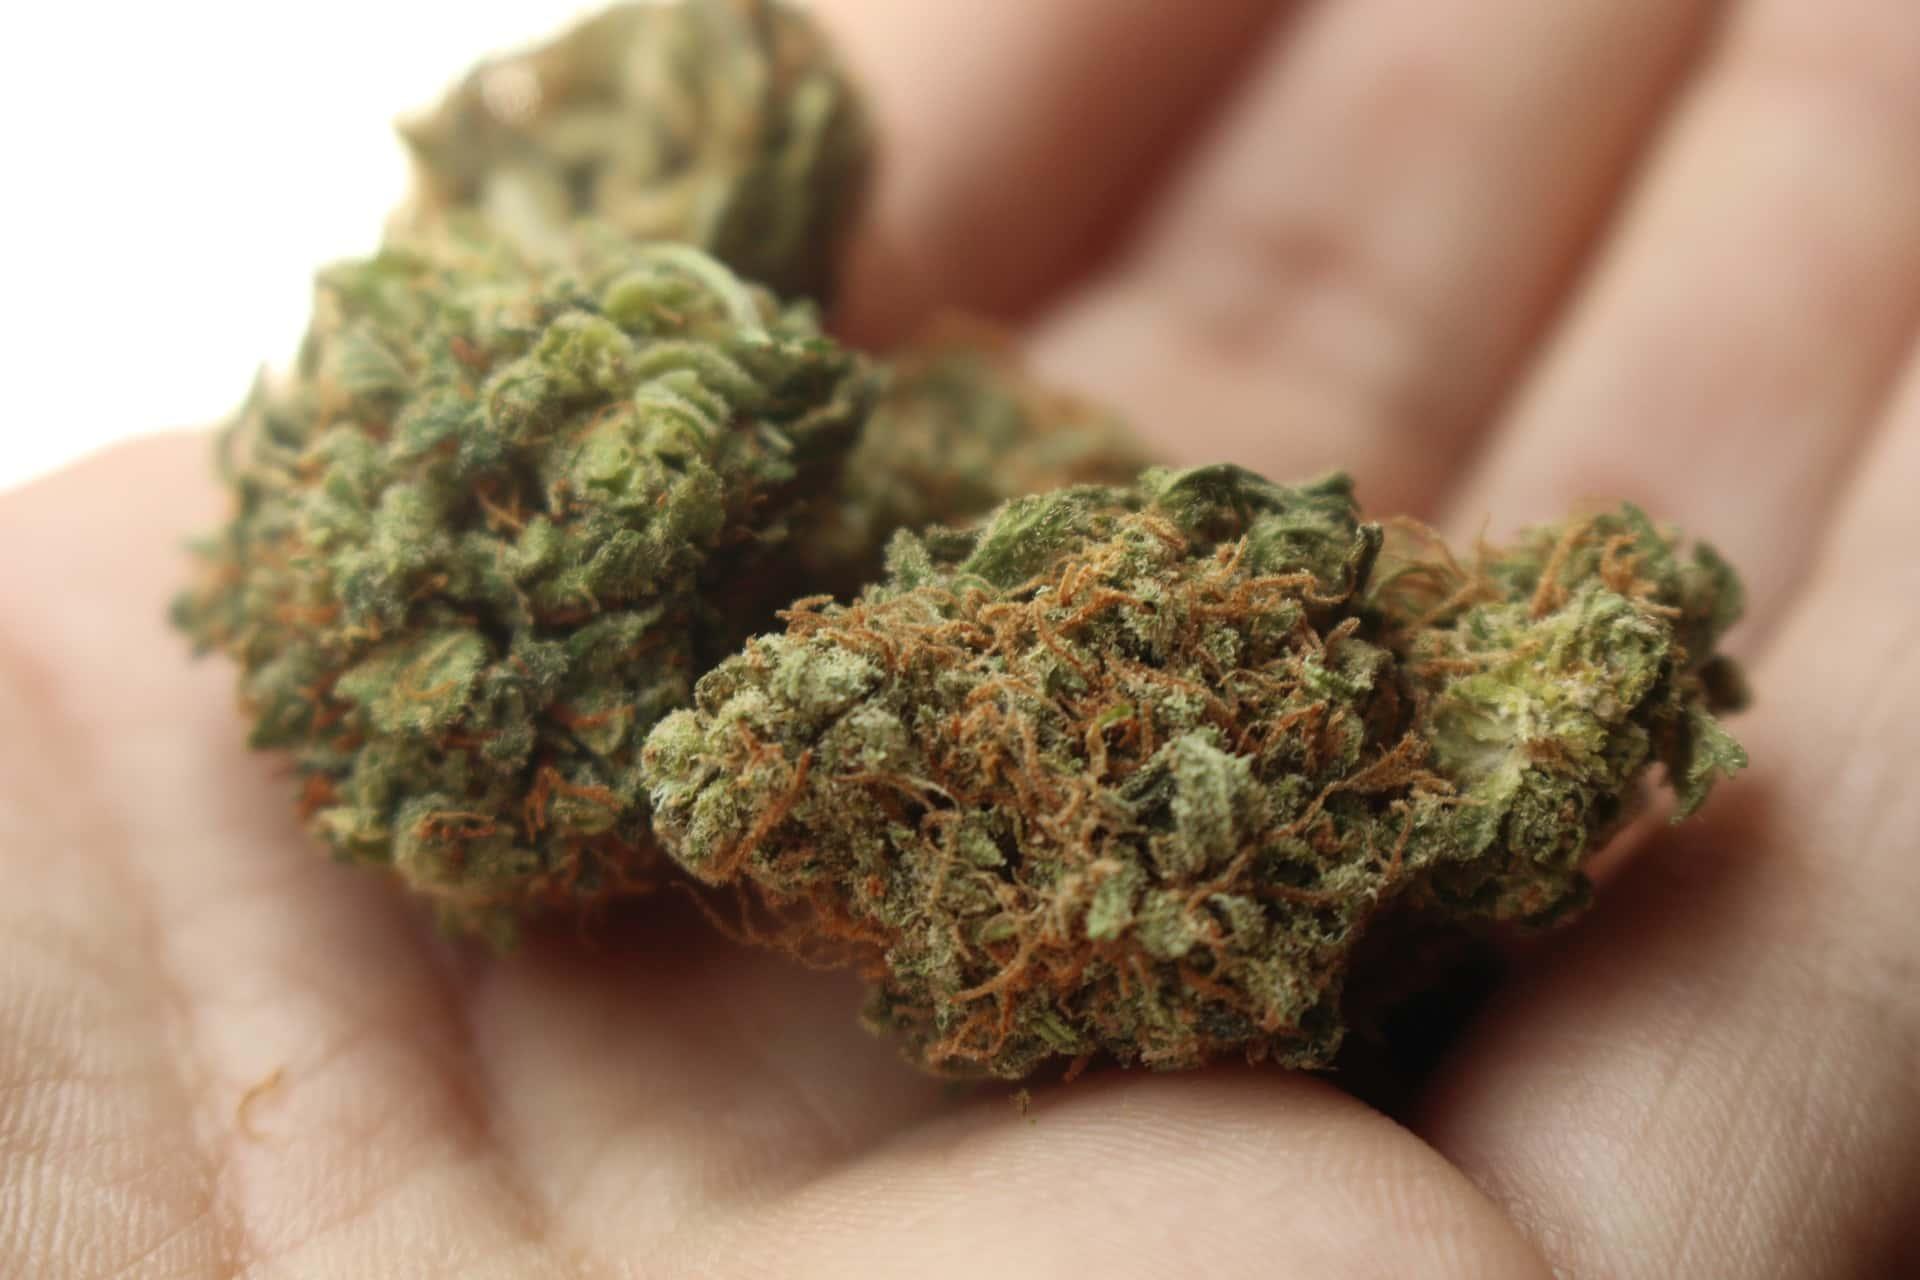 Legal Cannabis Sales Forecast to Grow 21% Per Year Through 2024